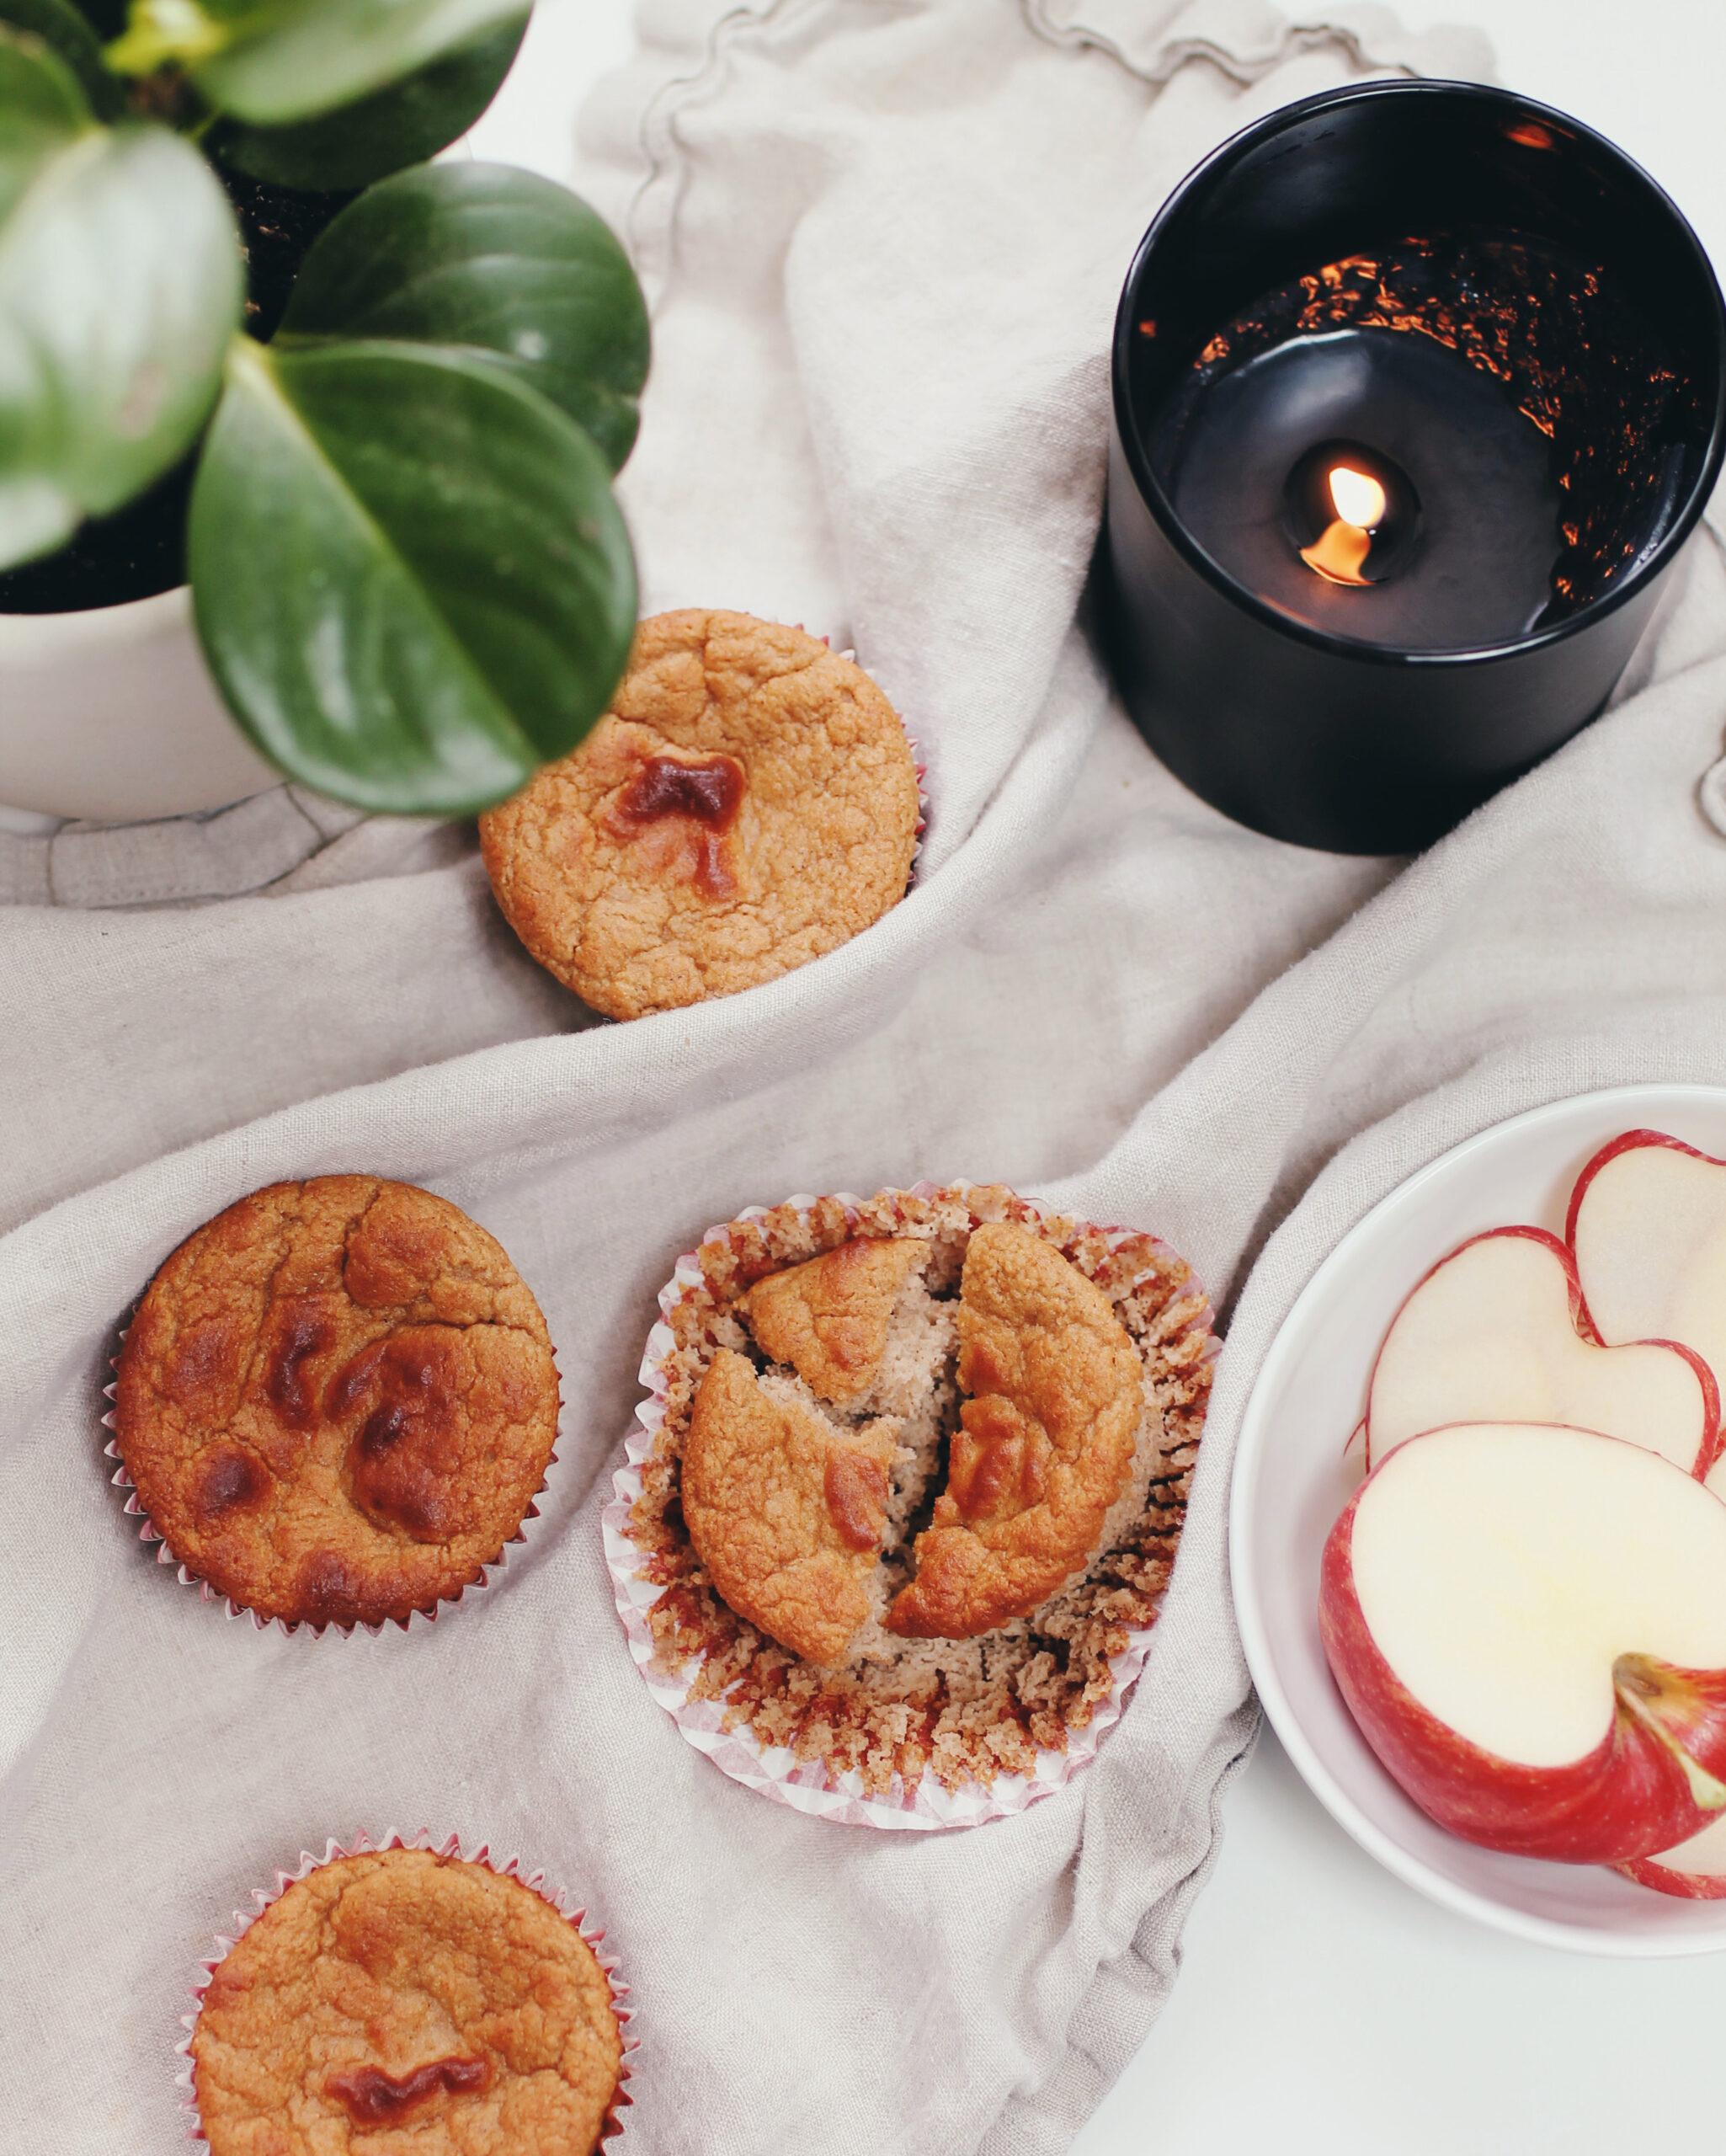 Healthy Applesauce Blender Muffins